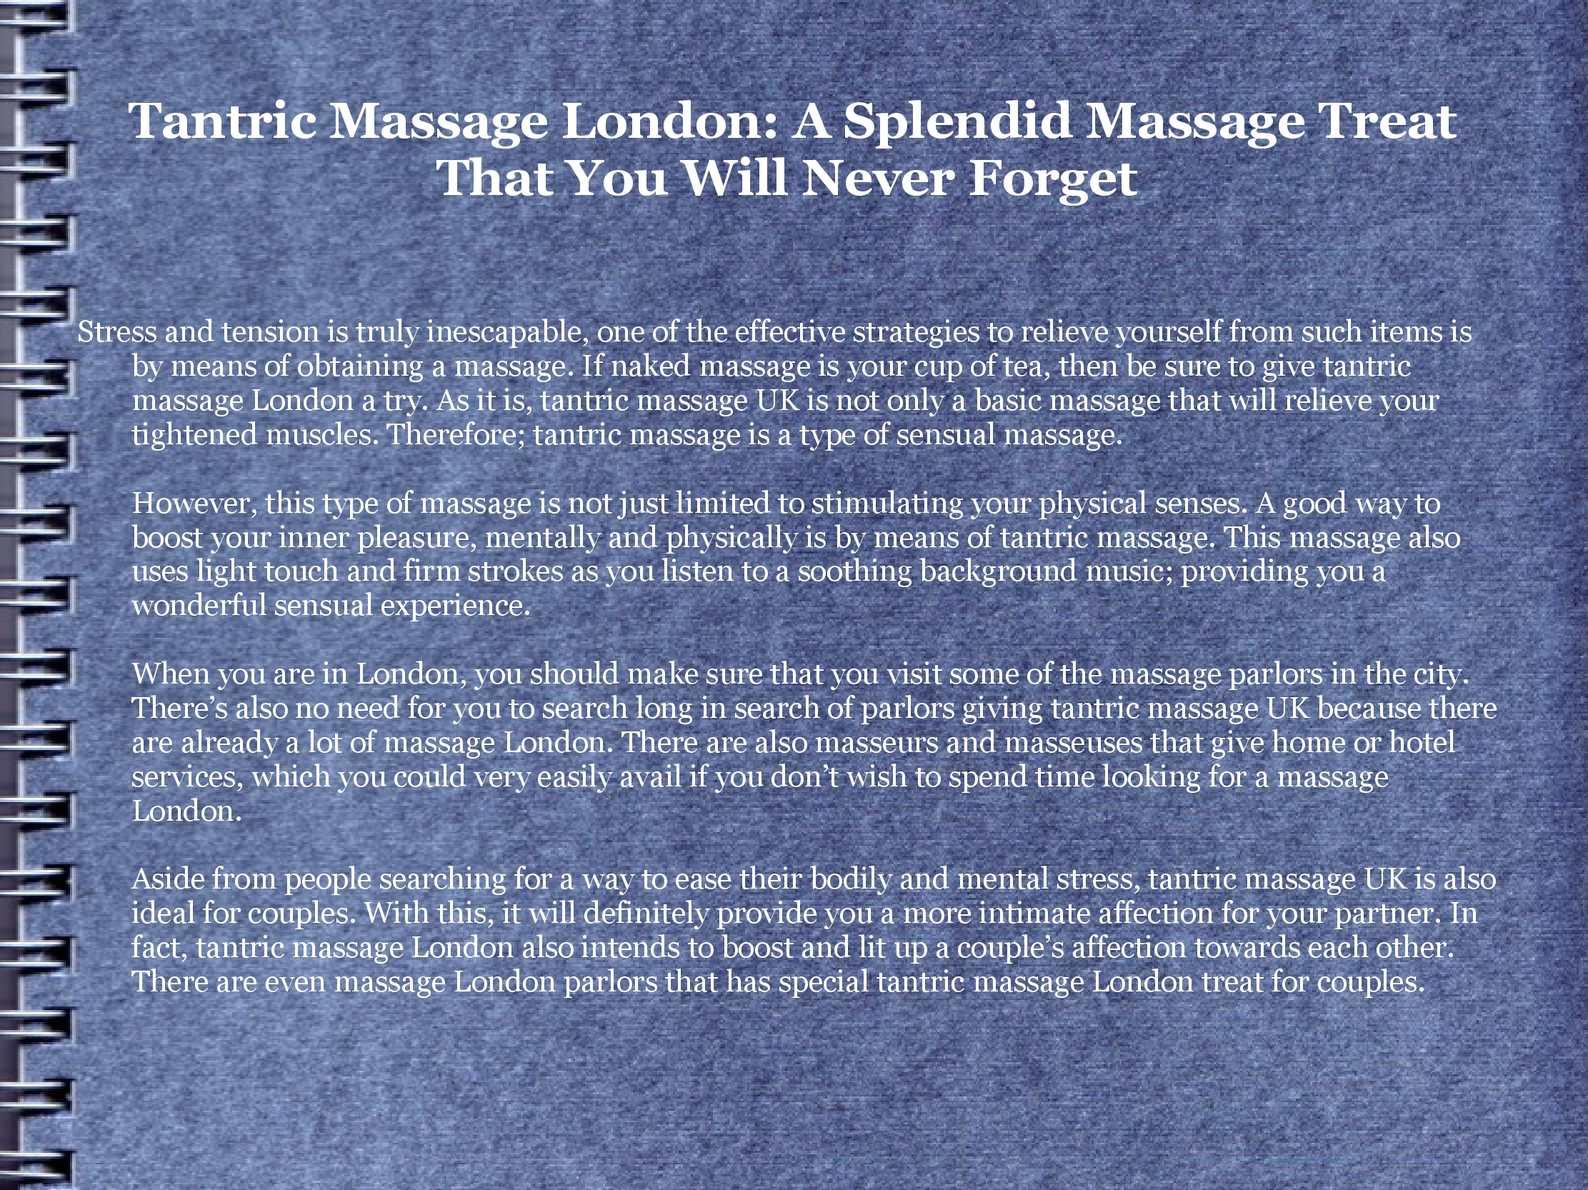 Busty massage parlor